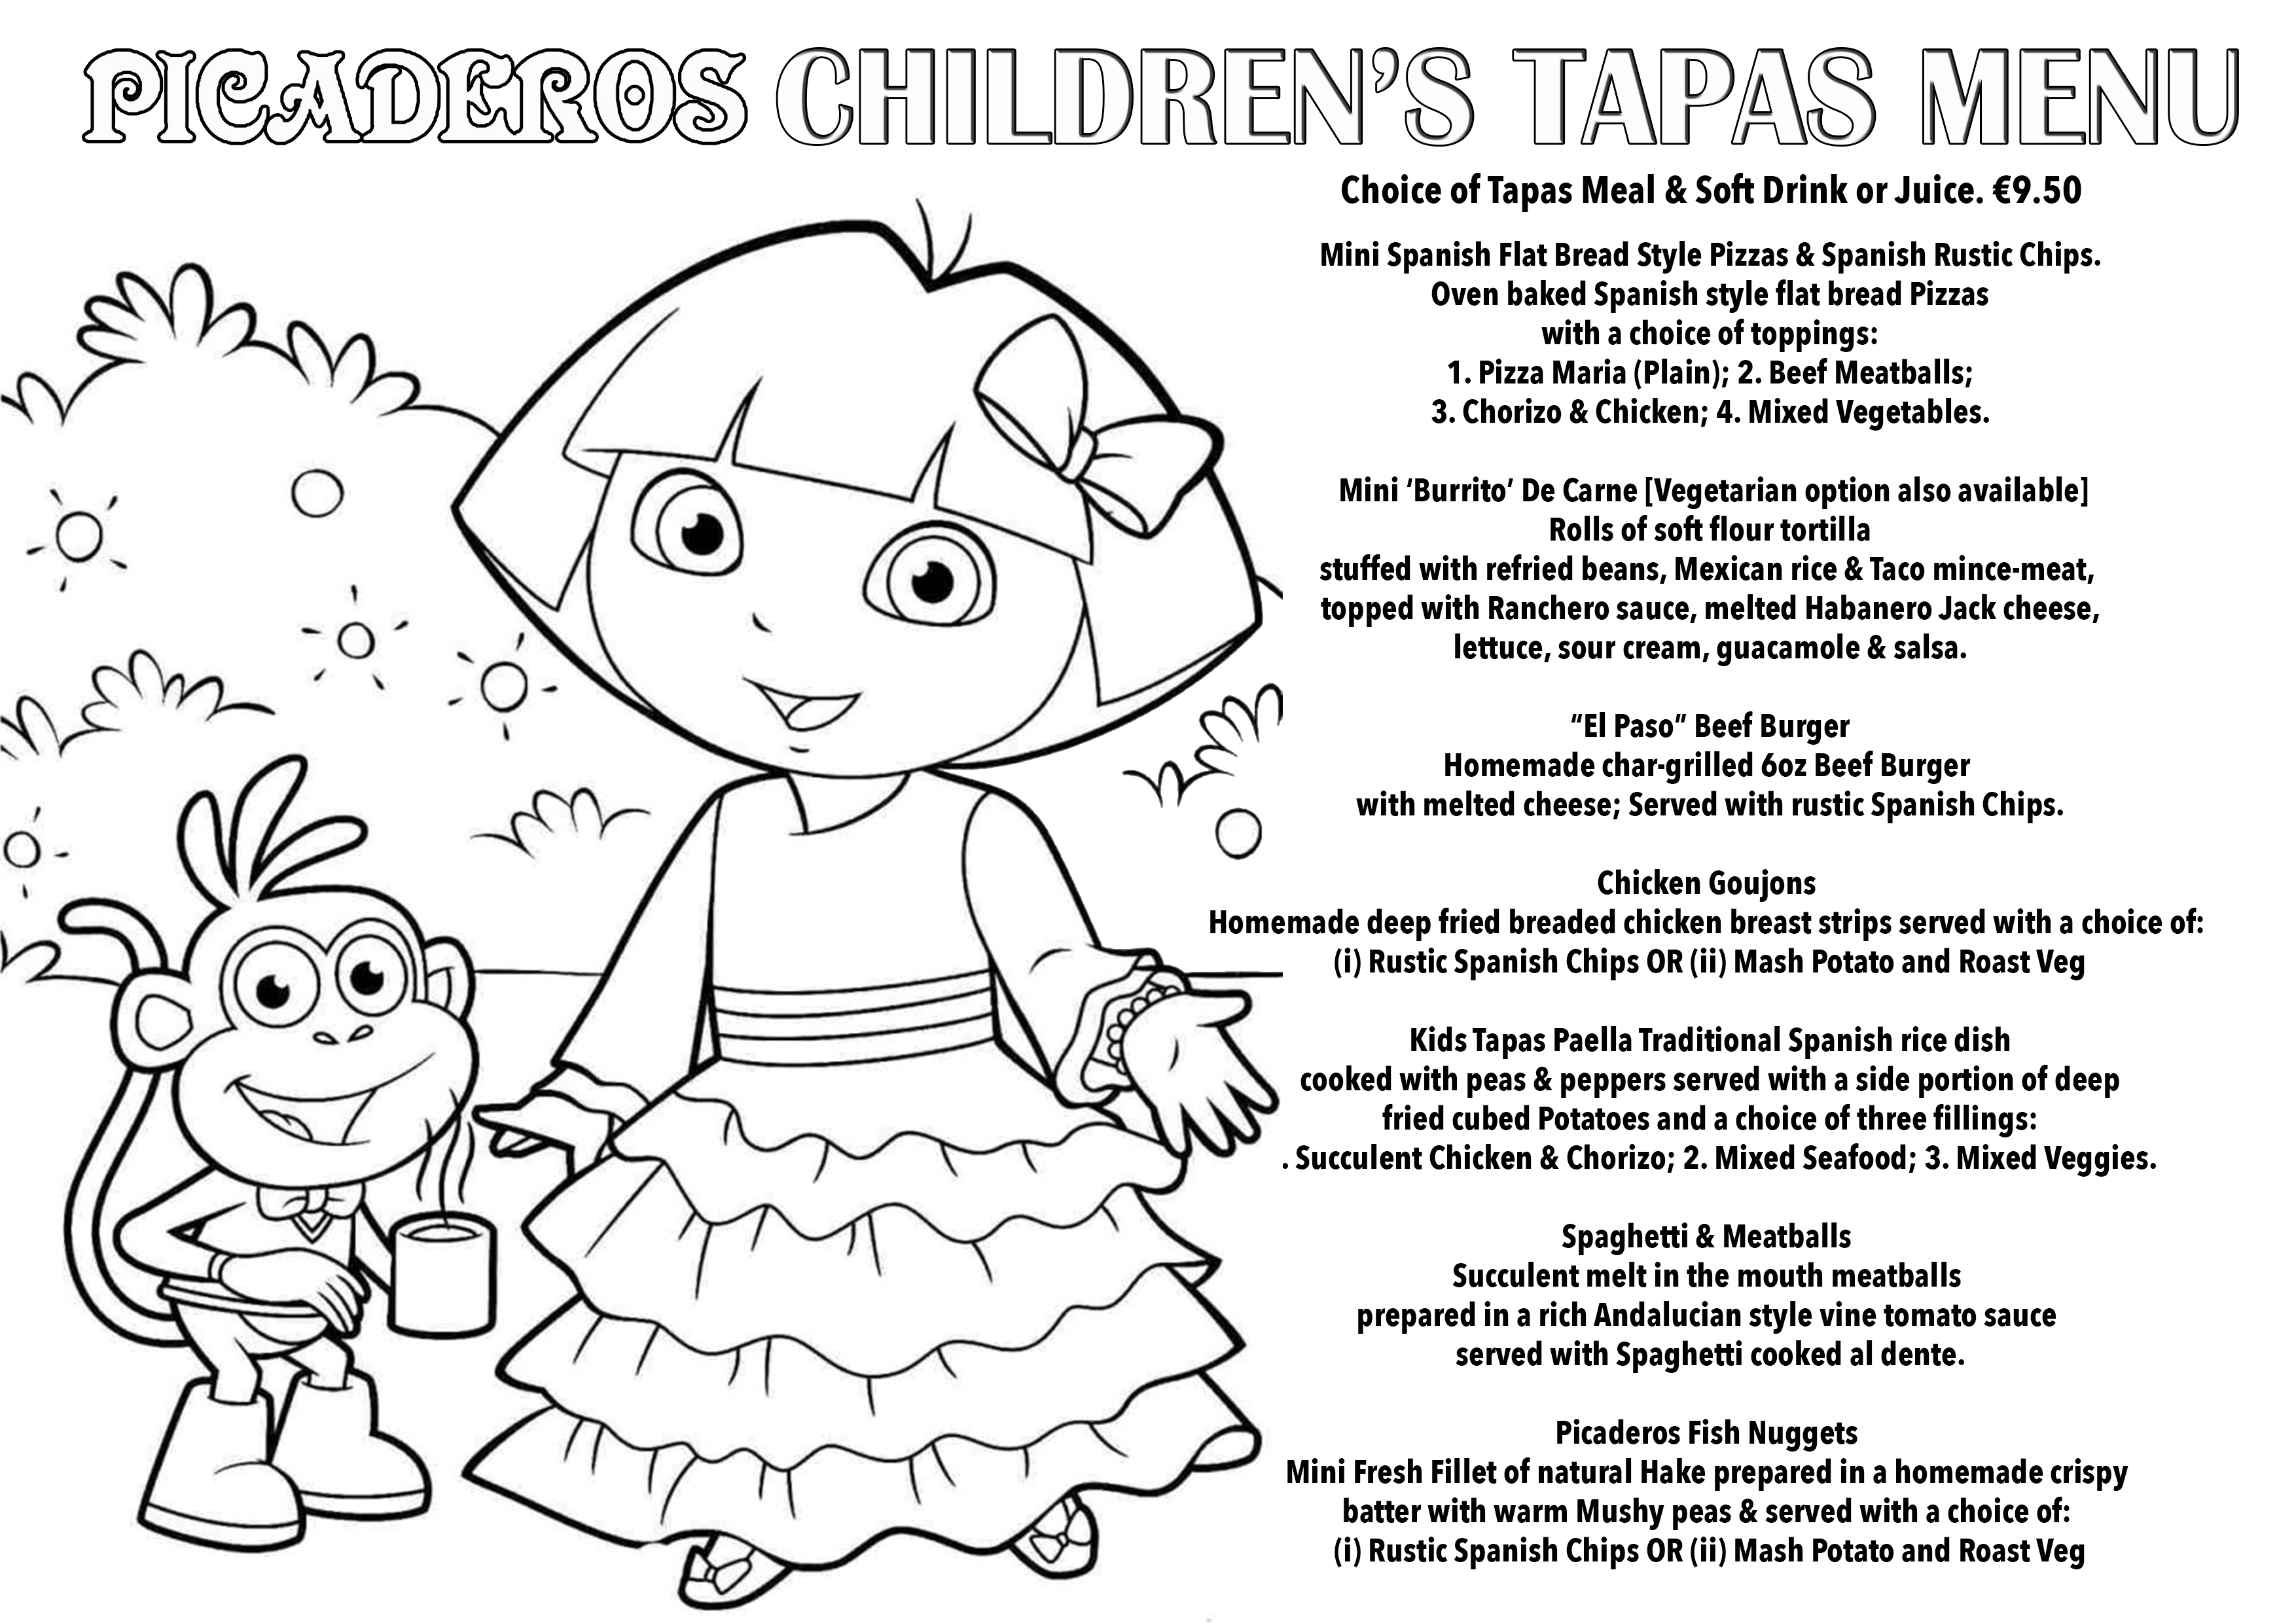 pic kids menu dora